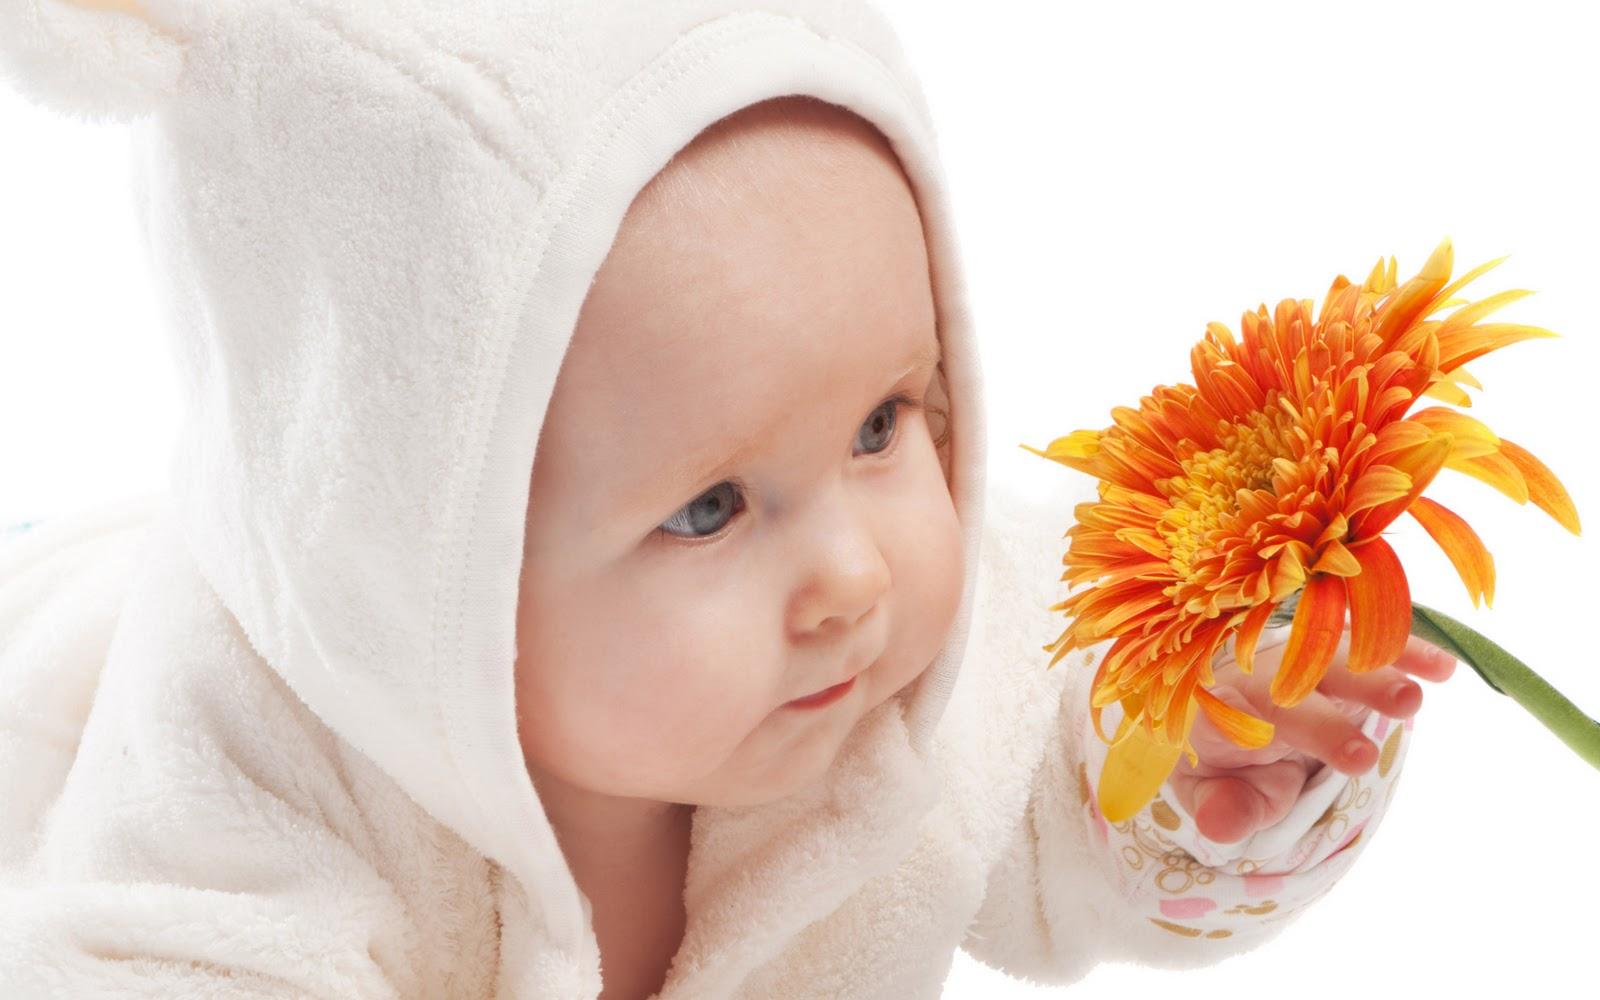 Cute baby hd wallpaper HD Wallpaper 1600x1000